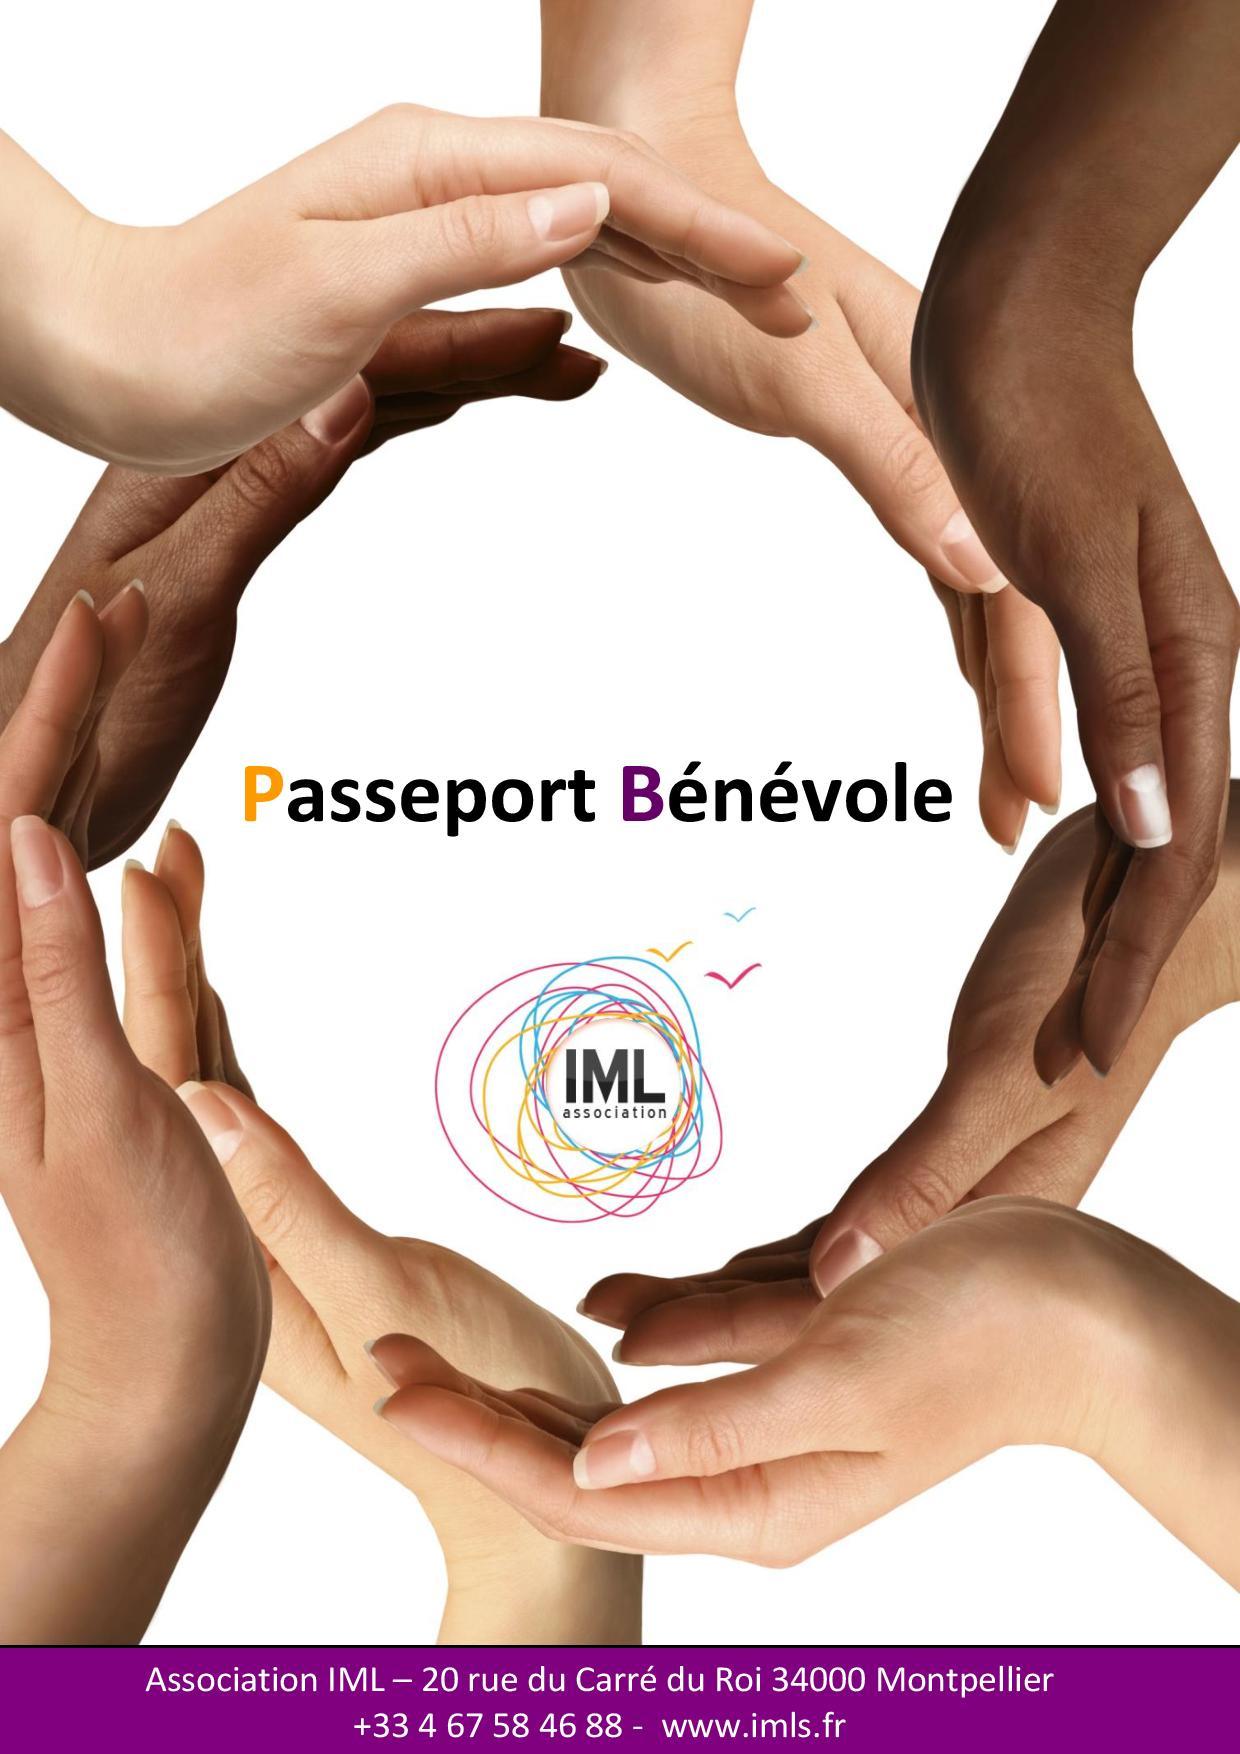 Passeport Bénévole